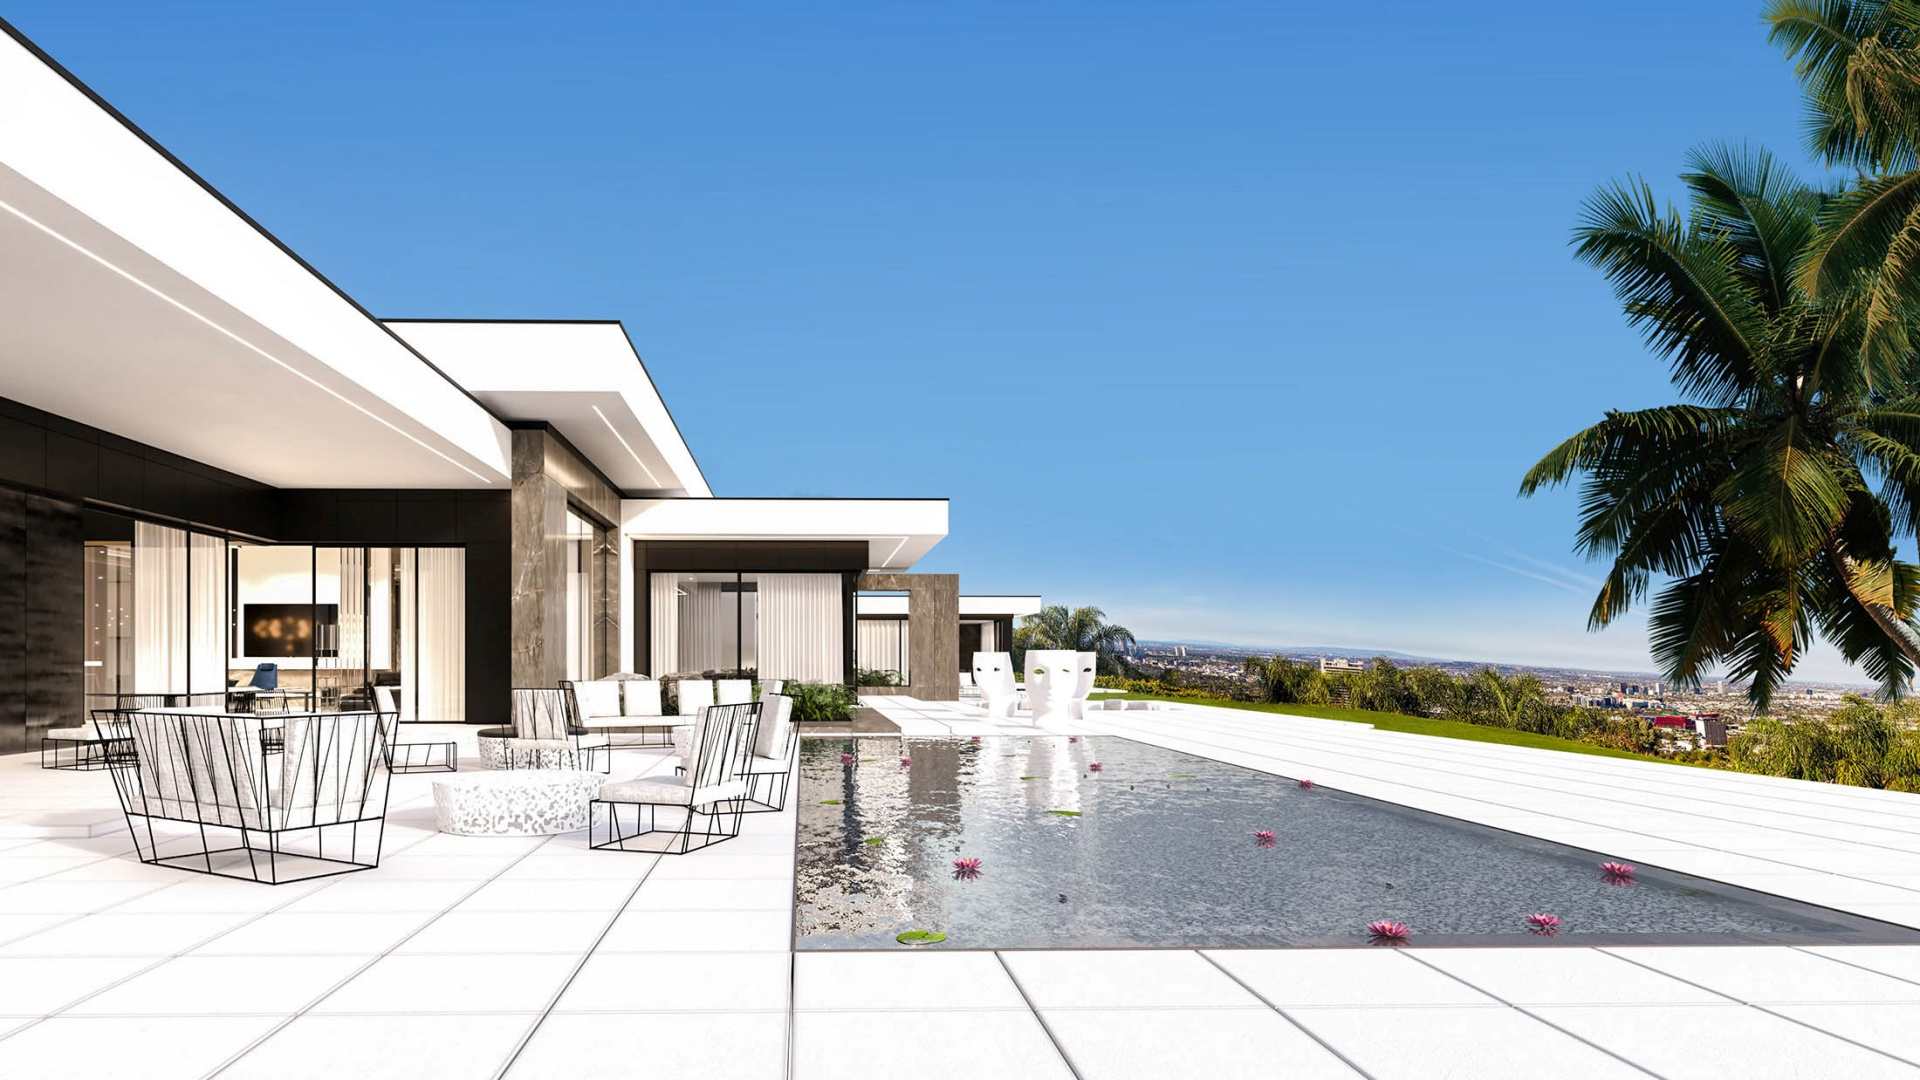 RE: BEVERLY HIILS HOUSE projektu architekta Marcina Tomaszewskiego REFORM Architekt